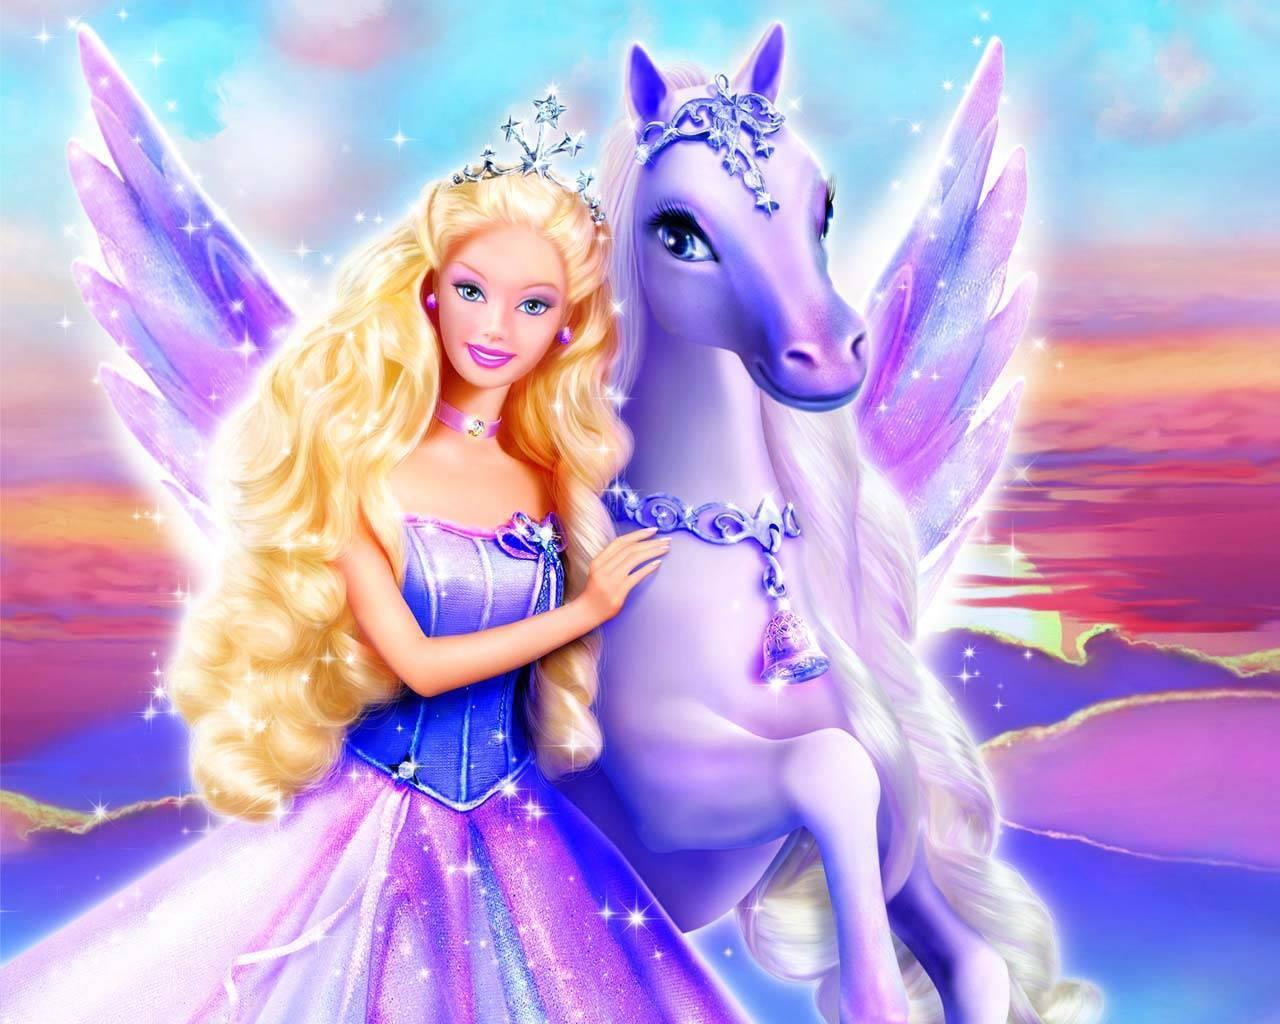 Princess Beautiful Doll Wallpaper HD 426